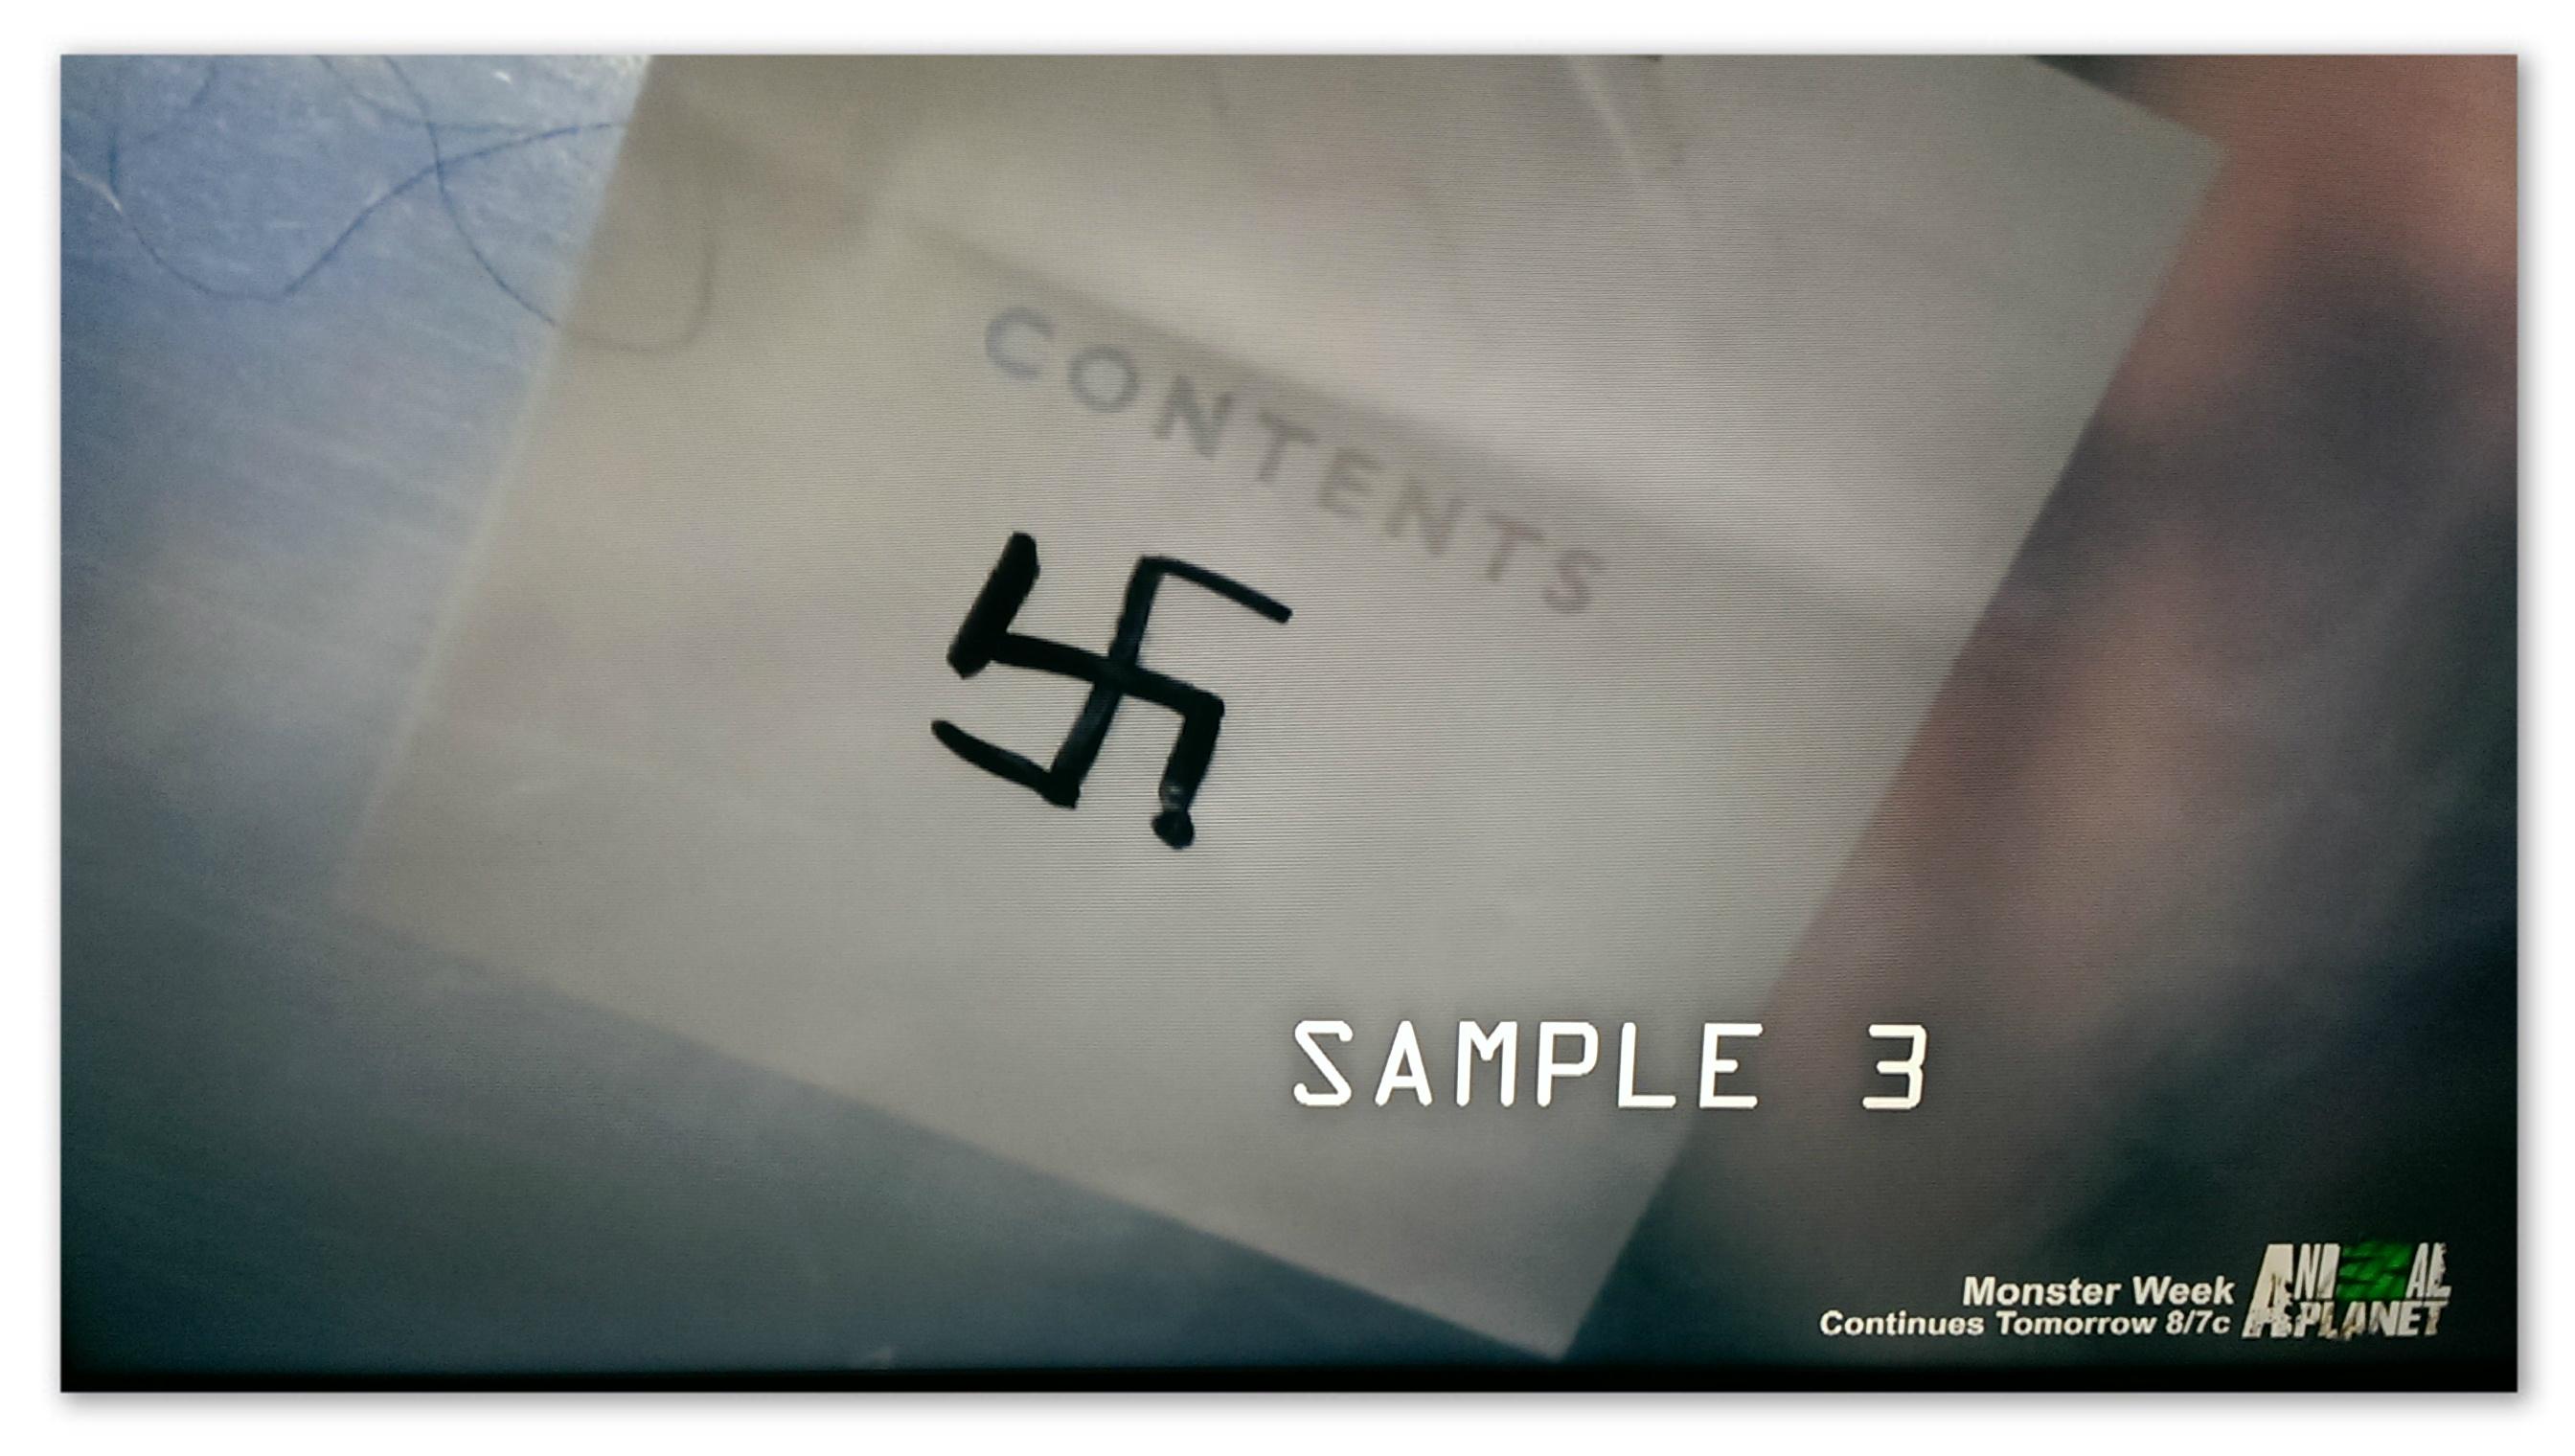 Are you freaking kidding me. Nazis.